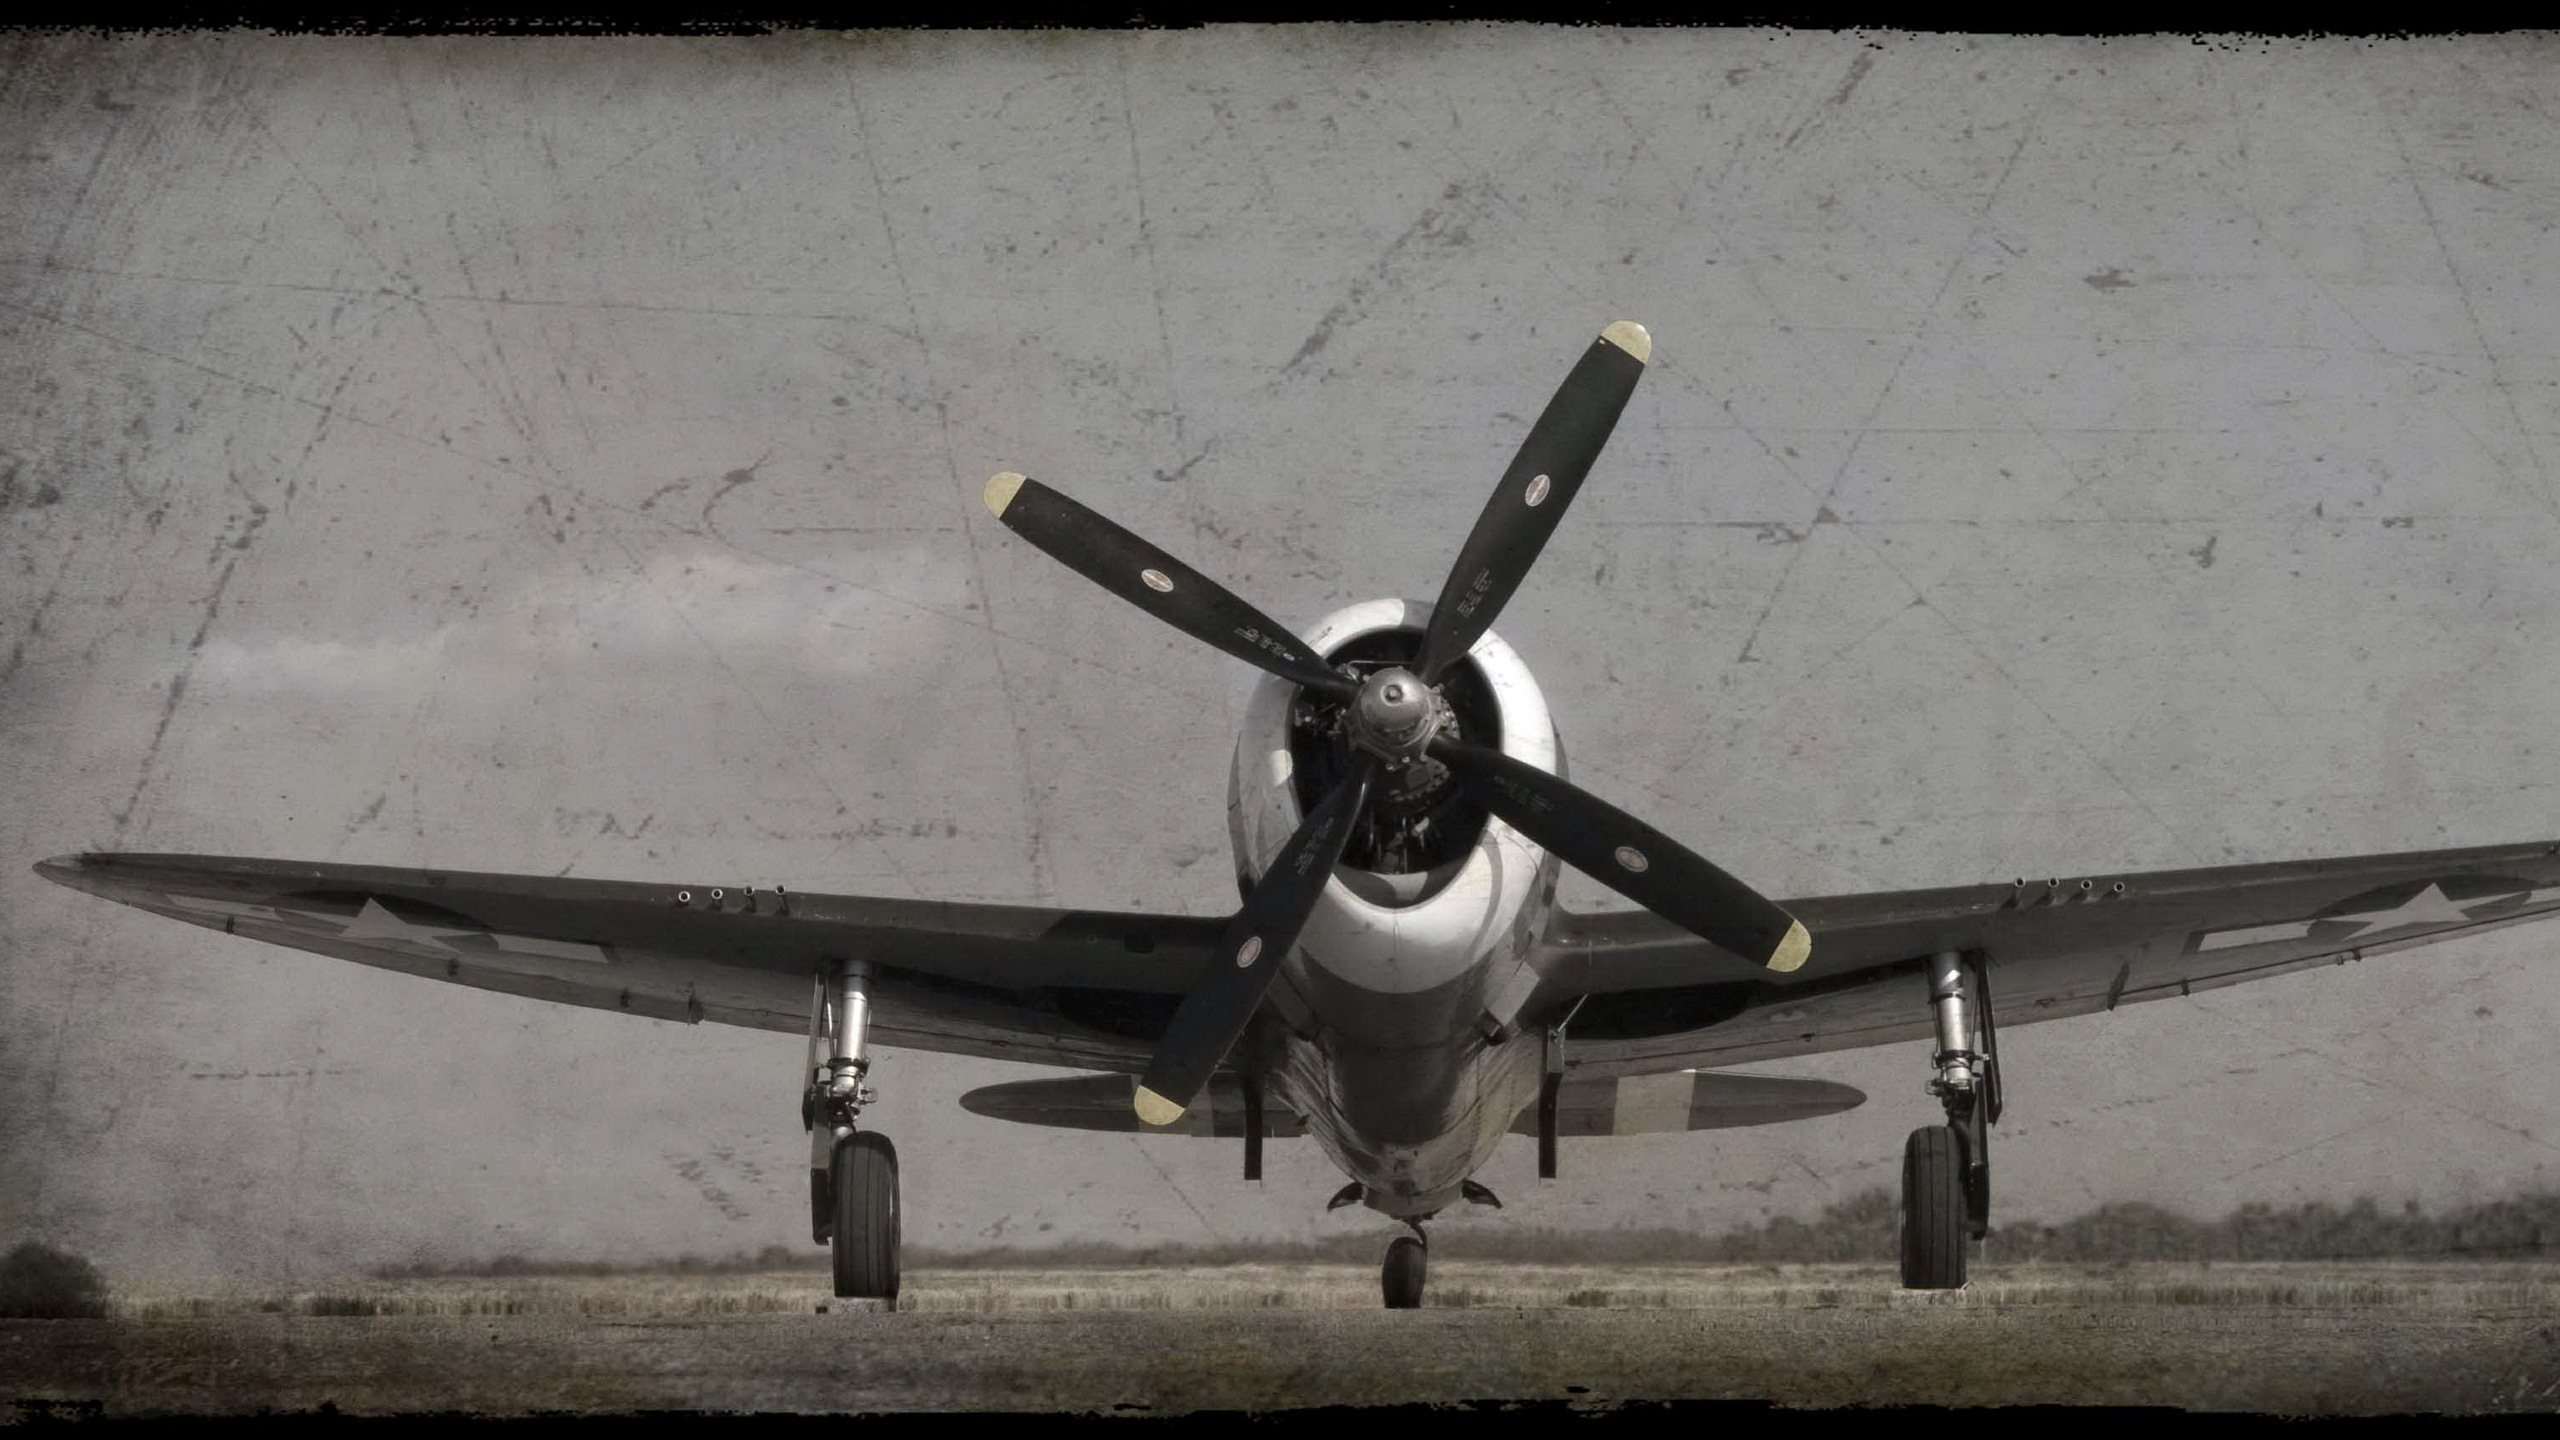 P47 Thunderbolt HD Wallpaper Background Image 2560x1440 ID 2560x1440